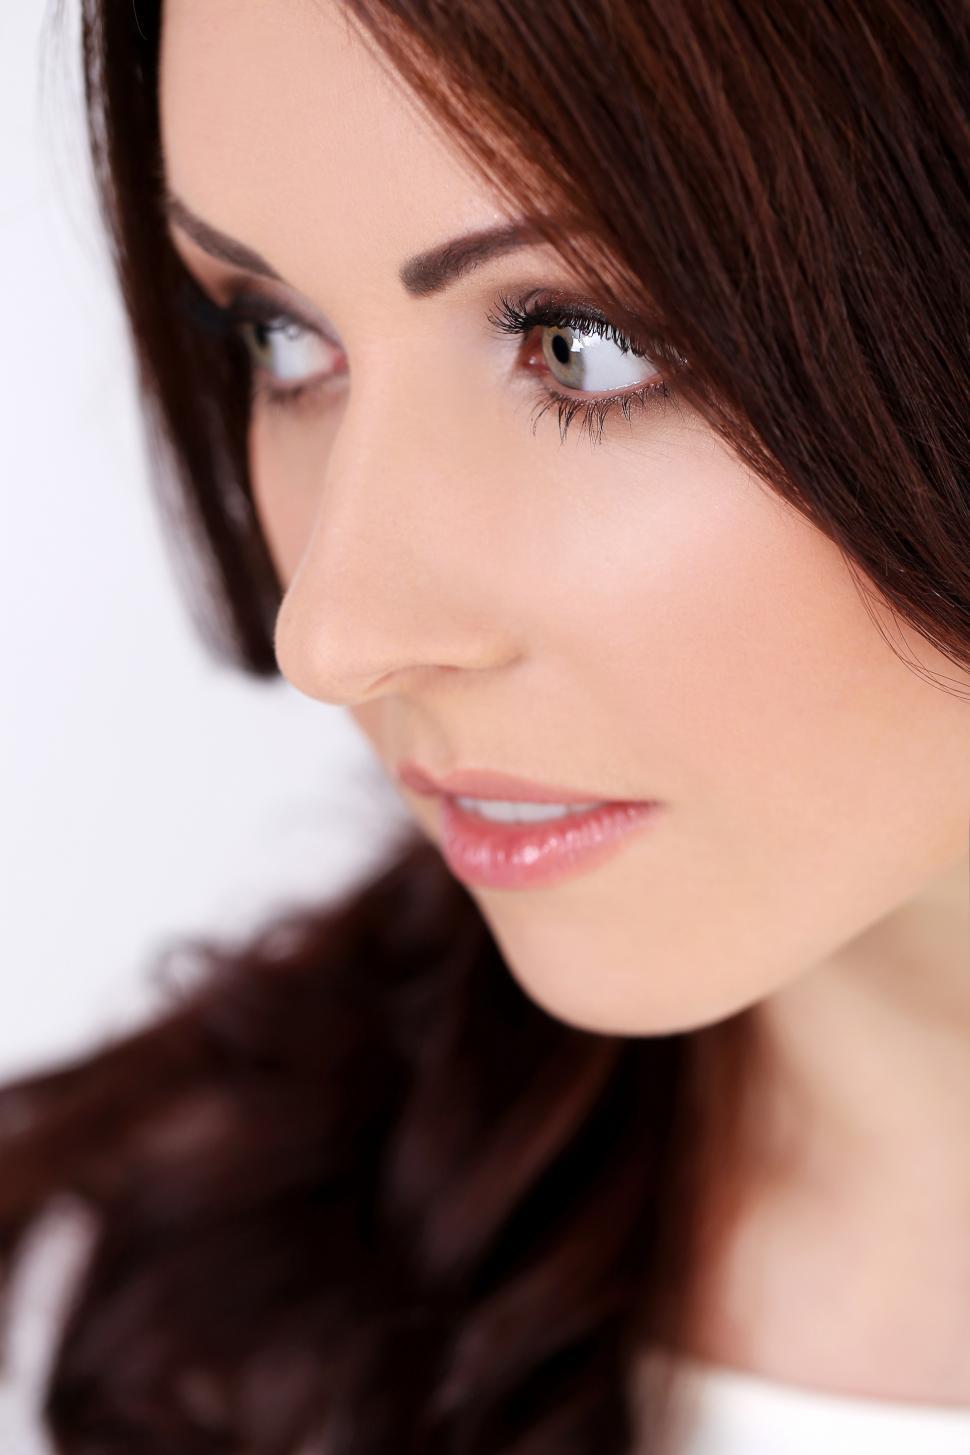 Download Free Stock Photo of Beautiful girl looking away